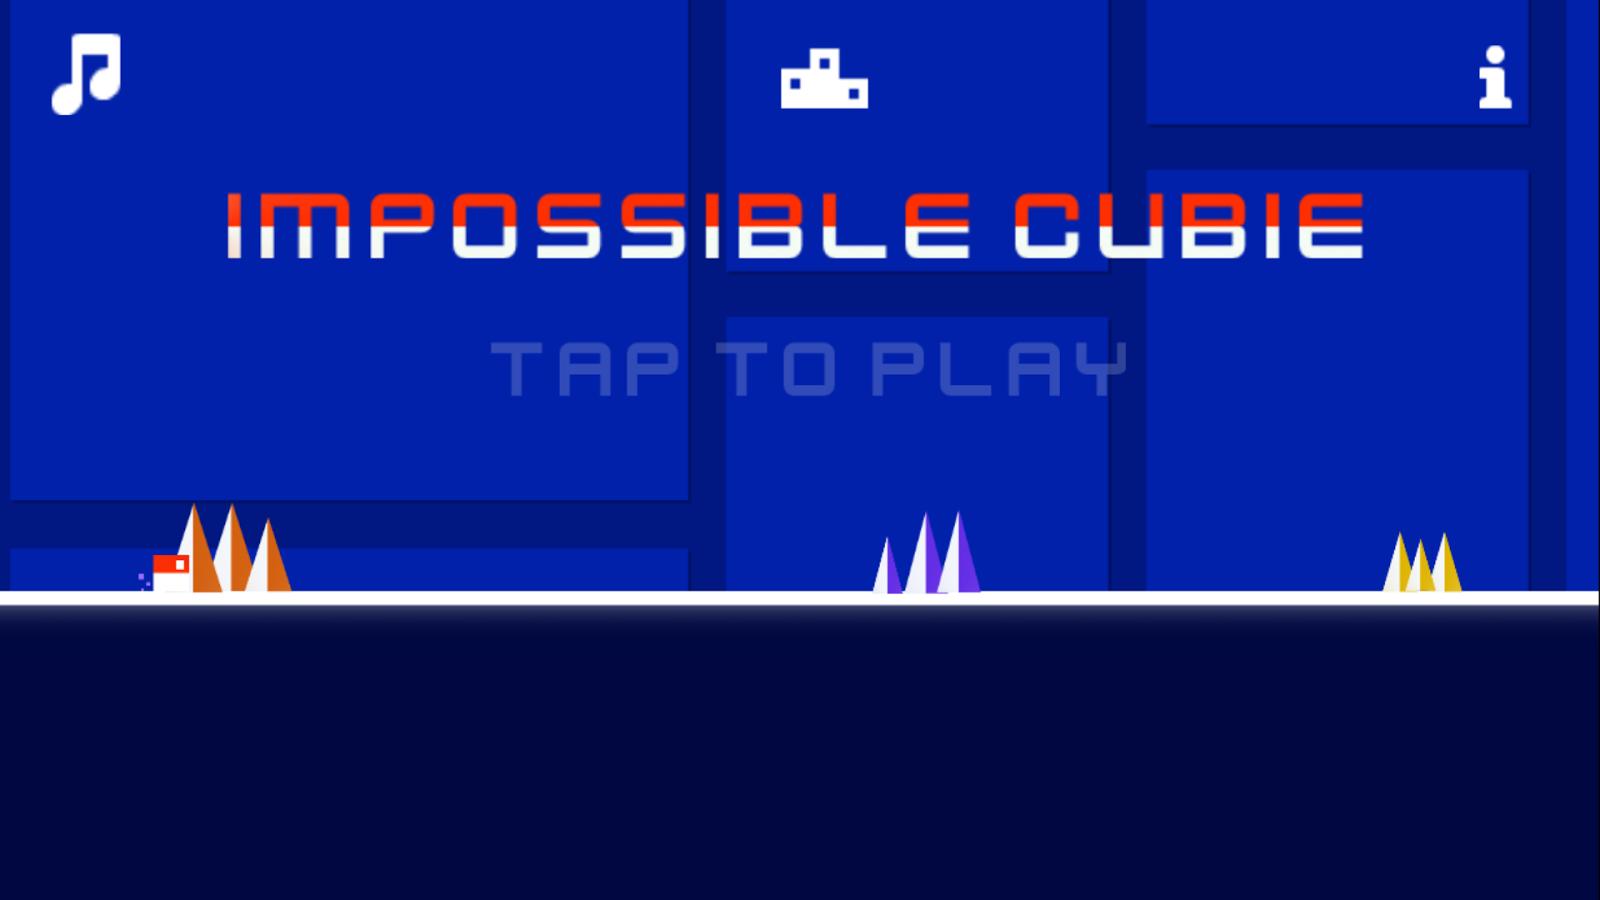 Impossible-Cubie 15